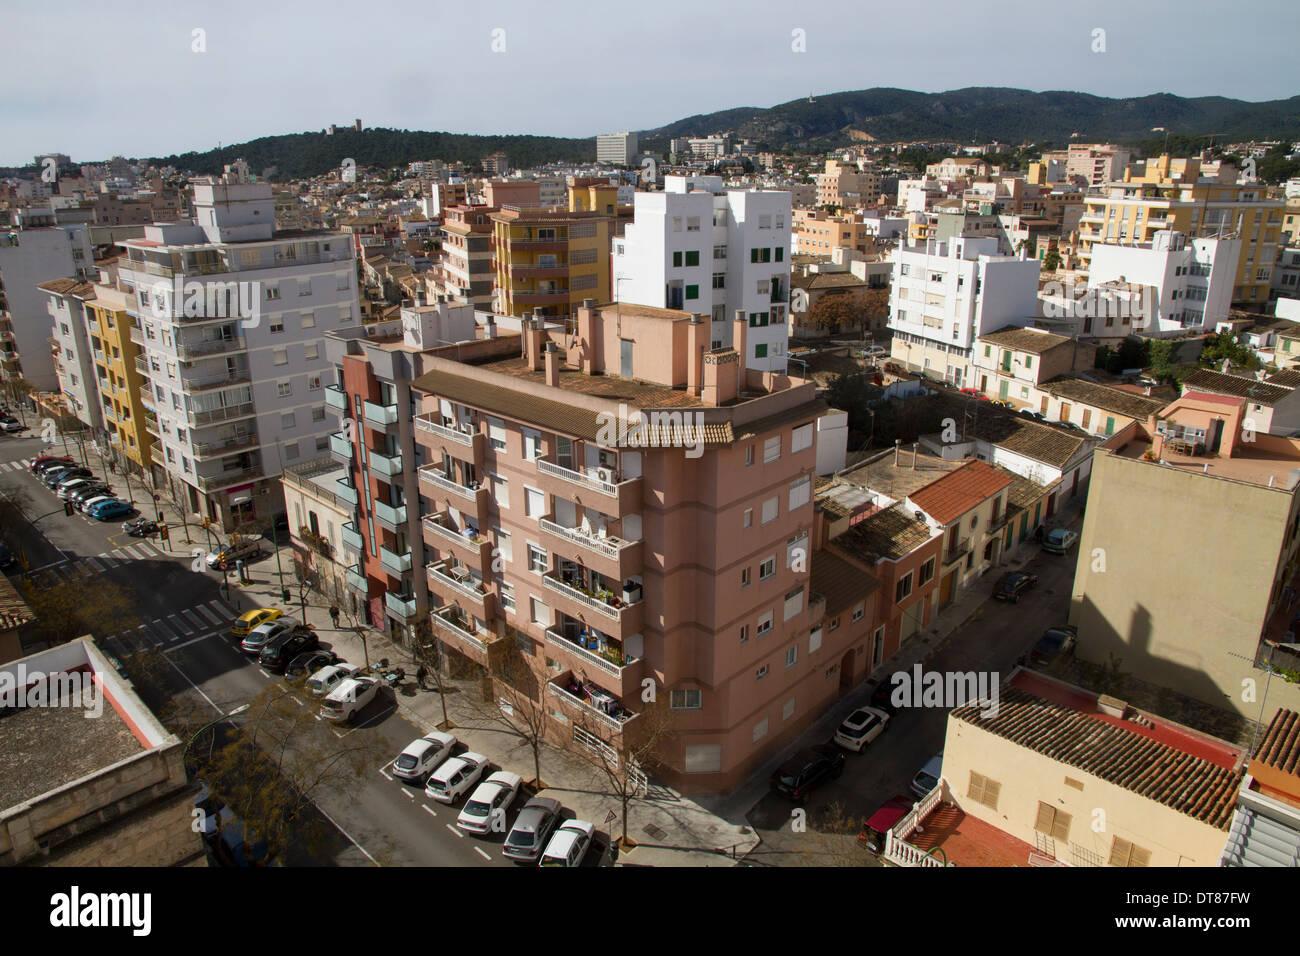 Palma de Mallorca edifice buildings city hi view Balearic islans Spain - Stock Image